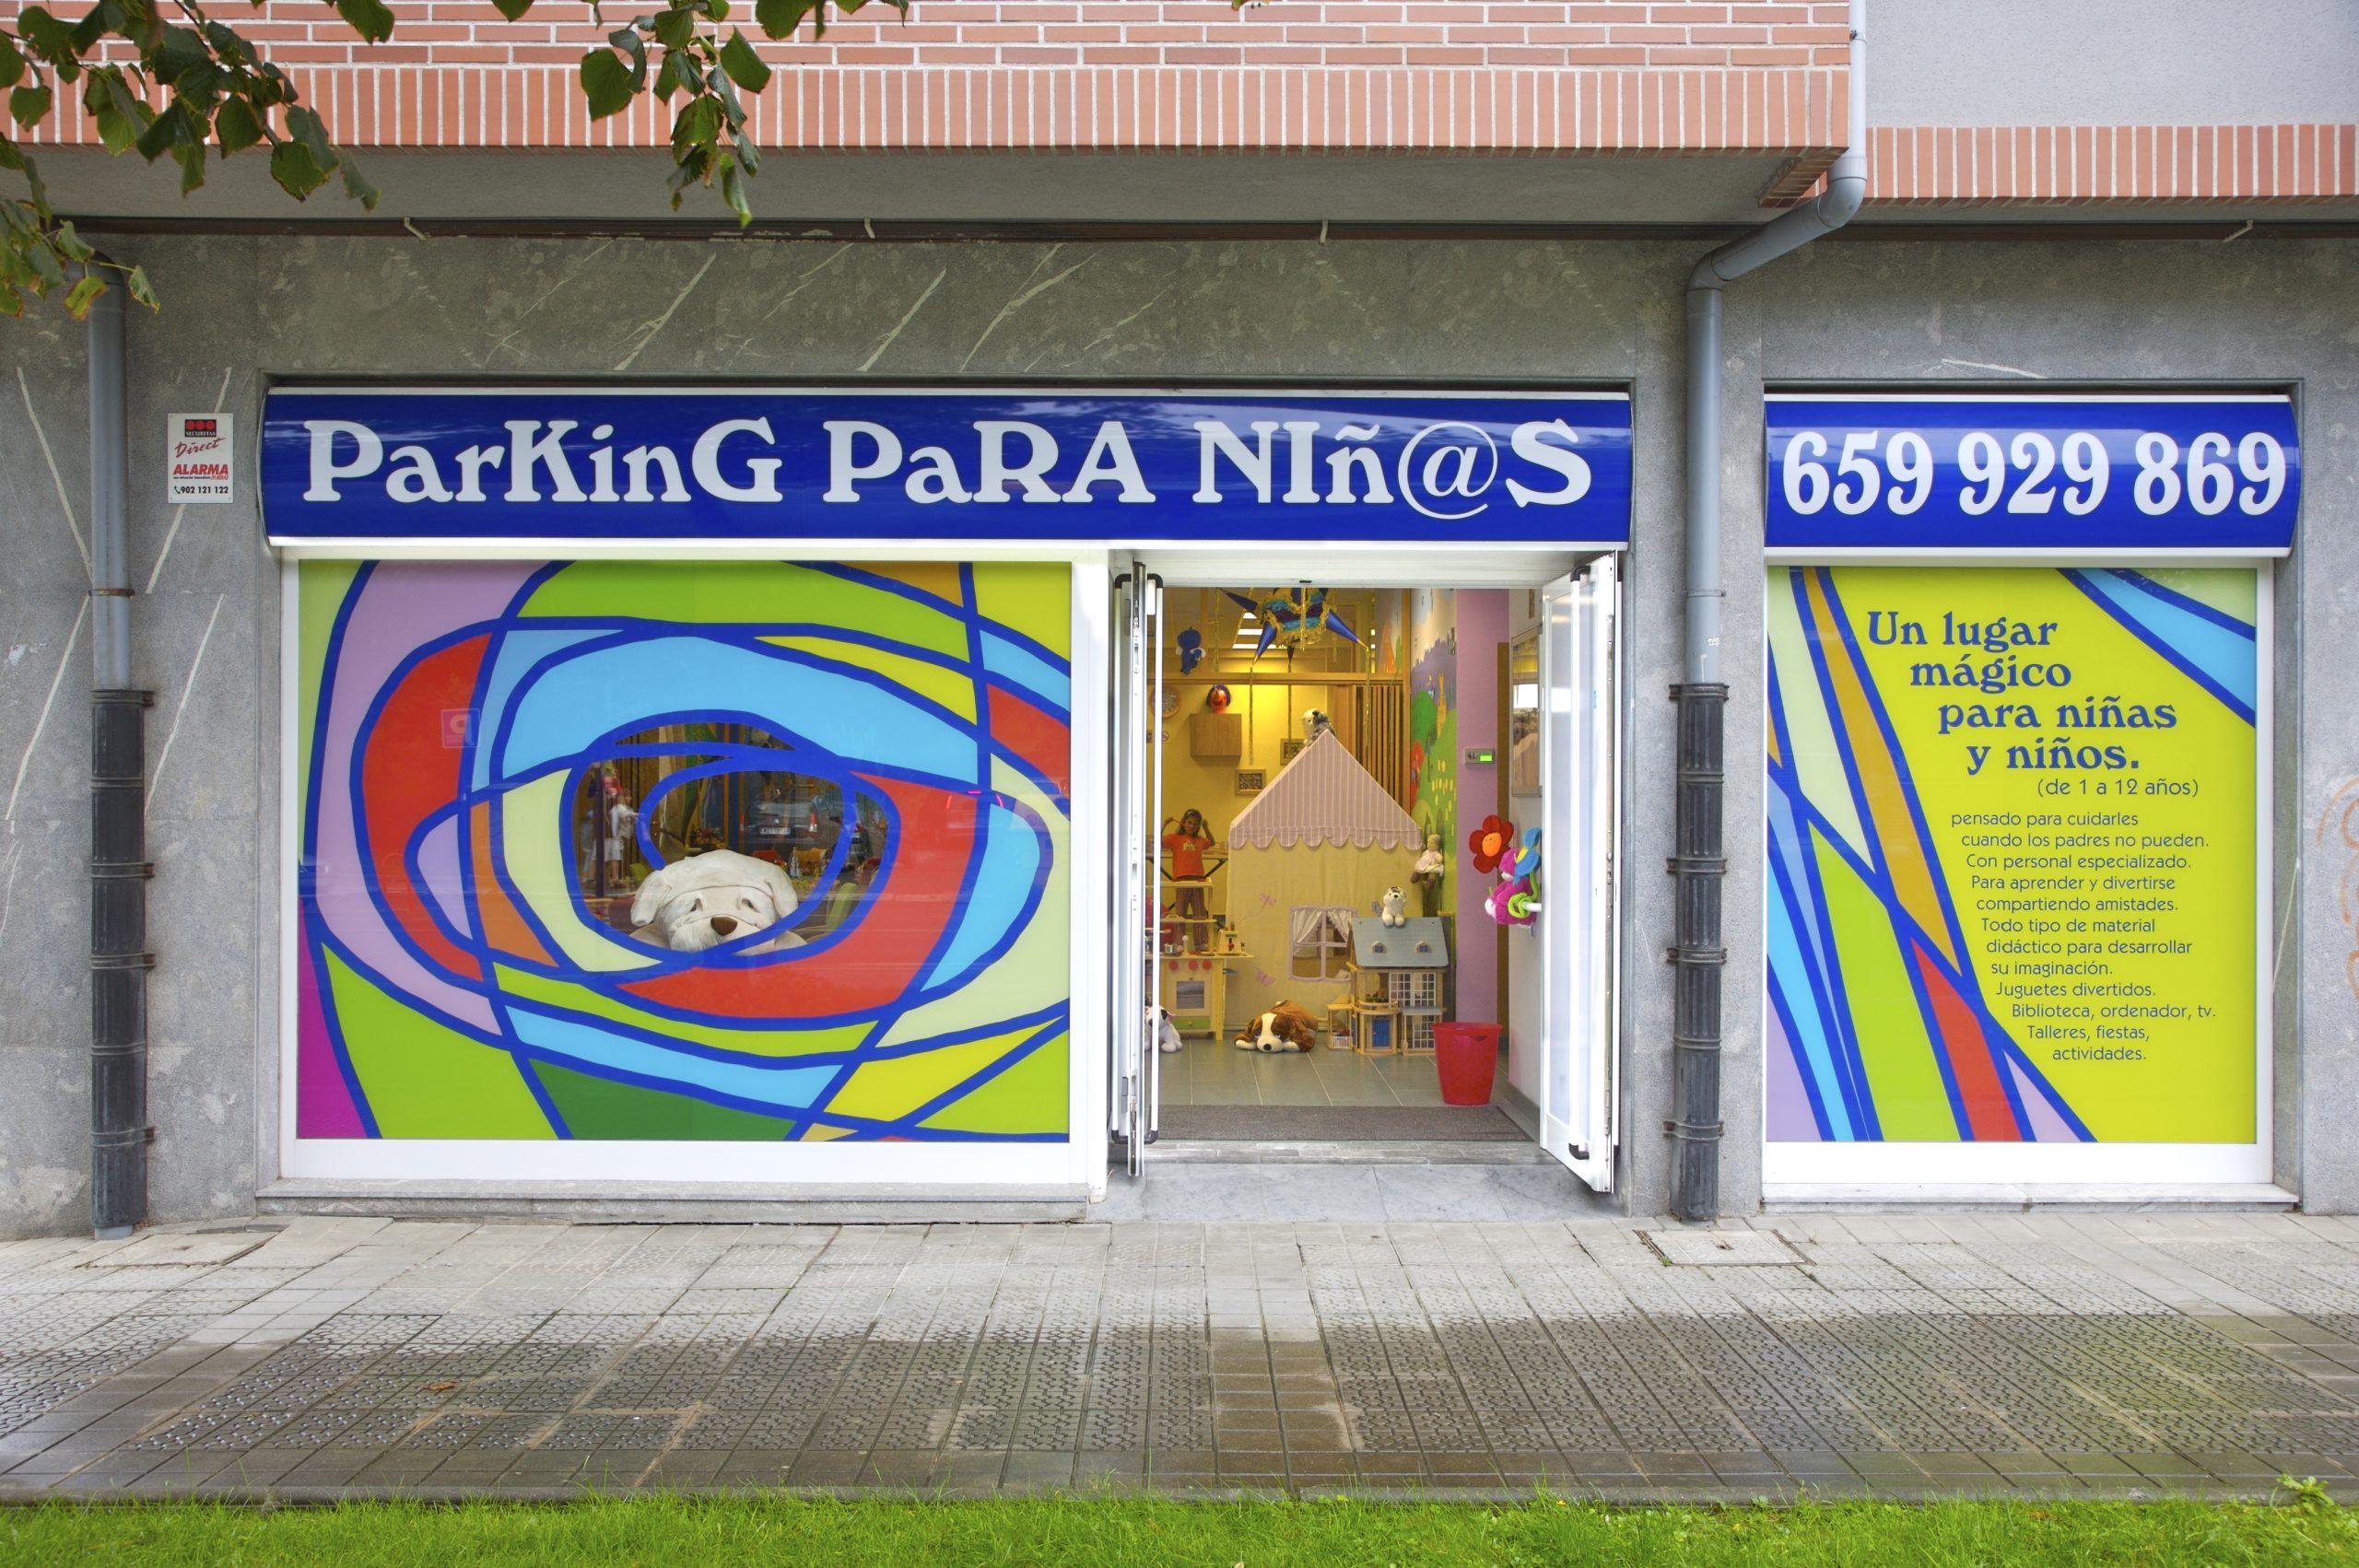 PARKING-PARA-NIÑOS-FRANQUICIA